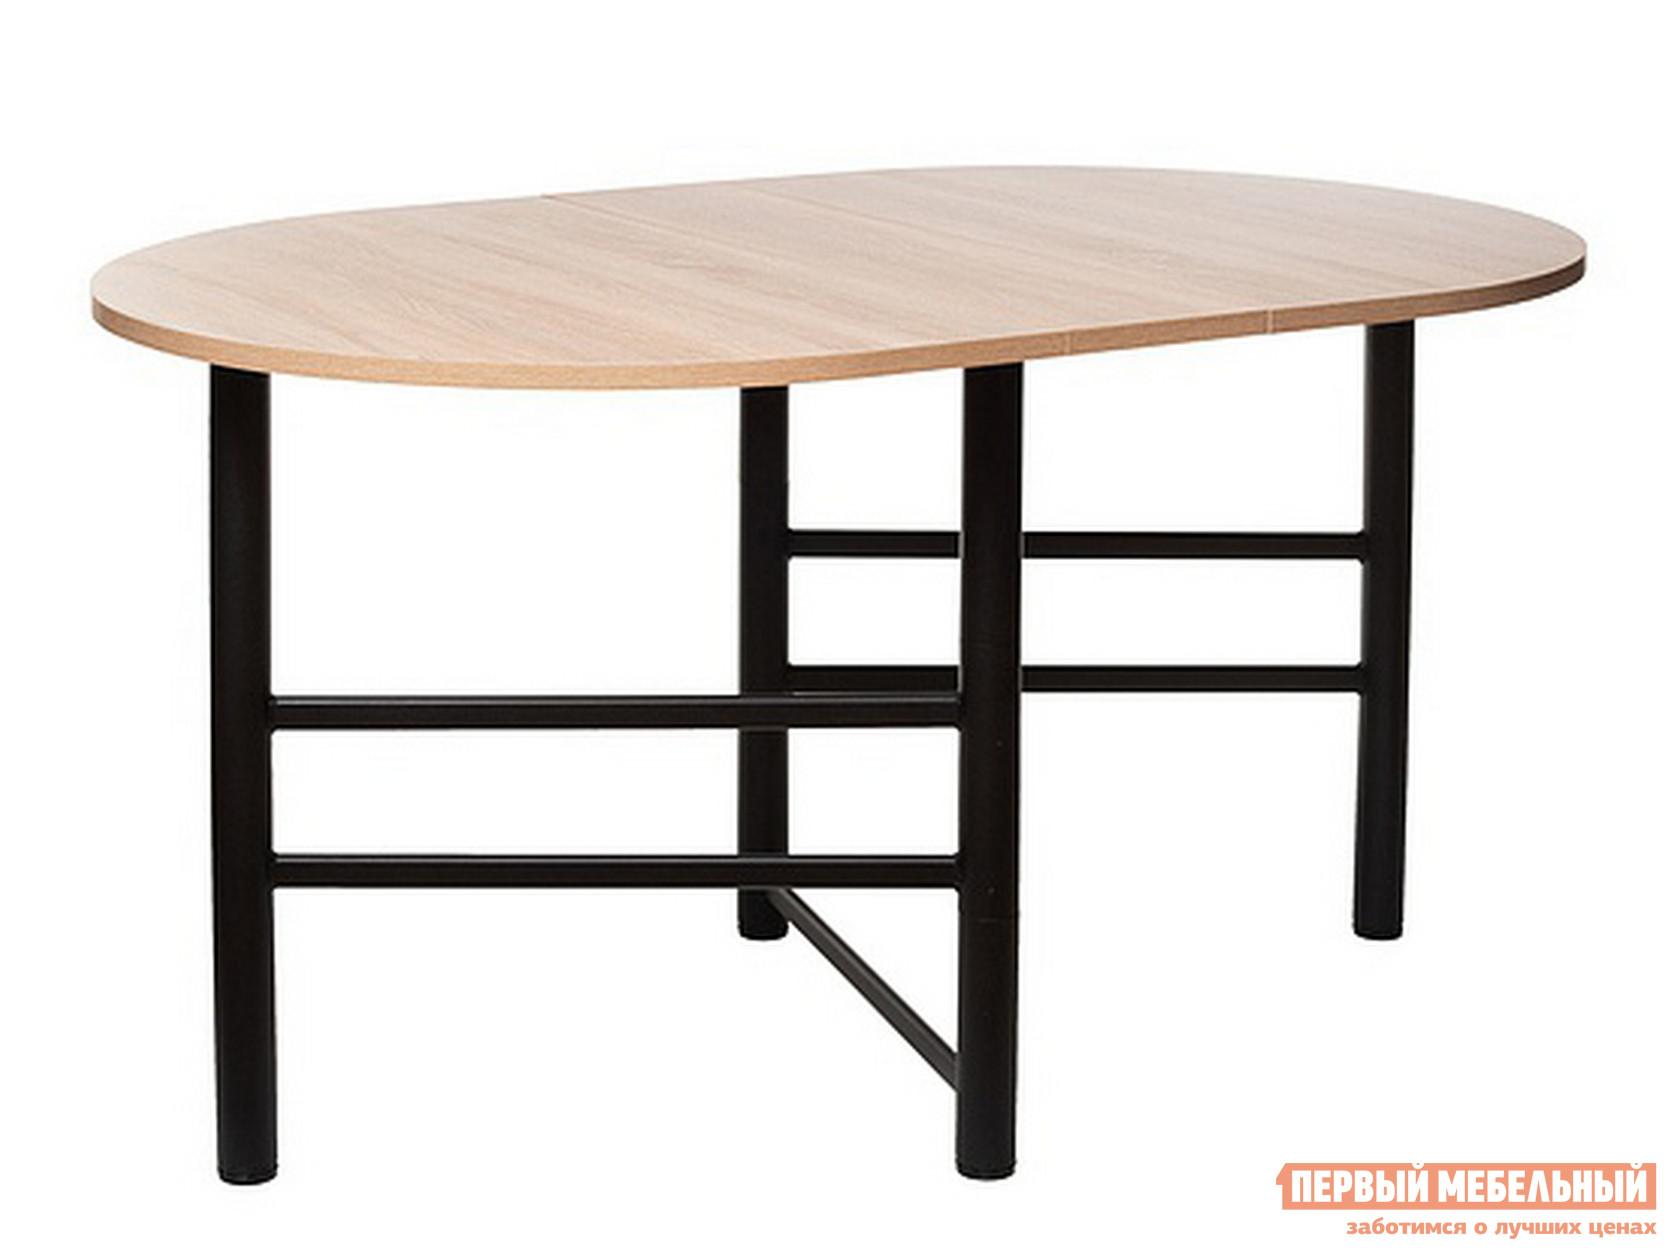 Кухонный стол  Стол Рим Дуб Сонома — Стол Рим Дуб Сонома